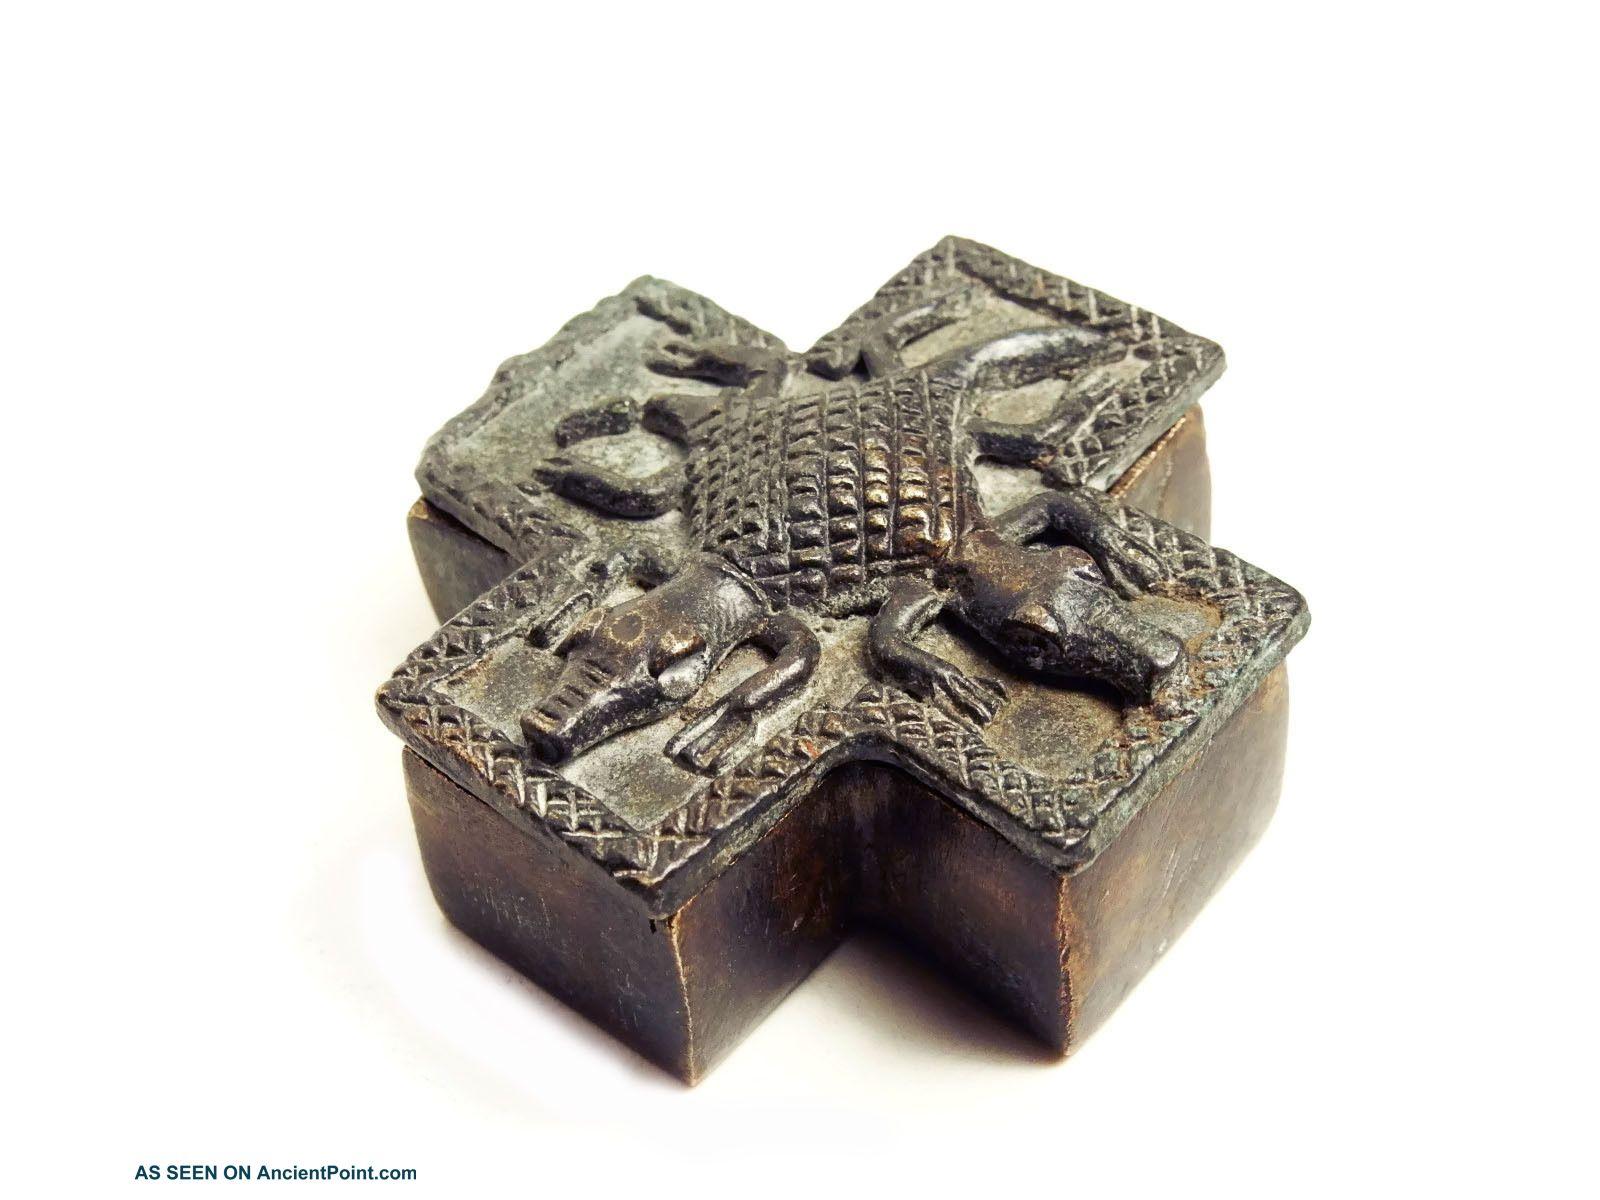 African Tribal Rare Antique Ashanti Cast Bronze Gold Sand Box - Double Crocodile Sculptures & Statues photo